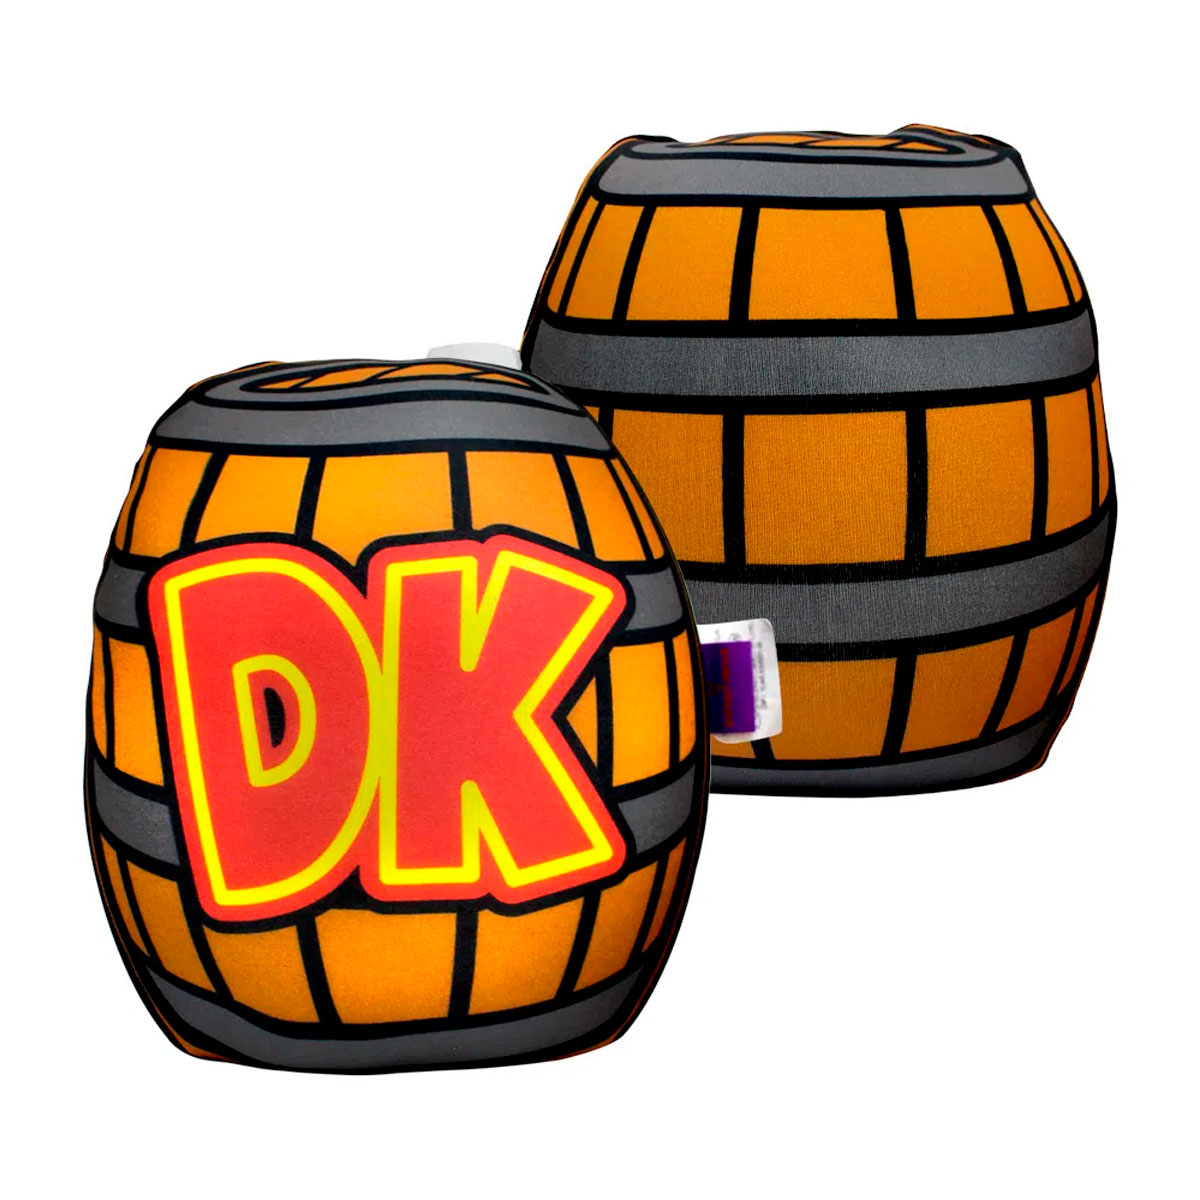 Almofada Formato Barril Donkey Kong - Presente Super